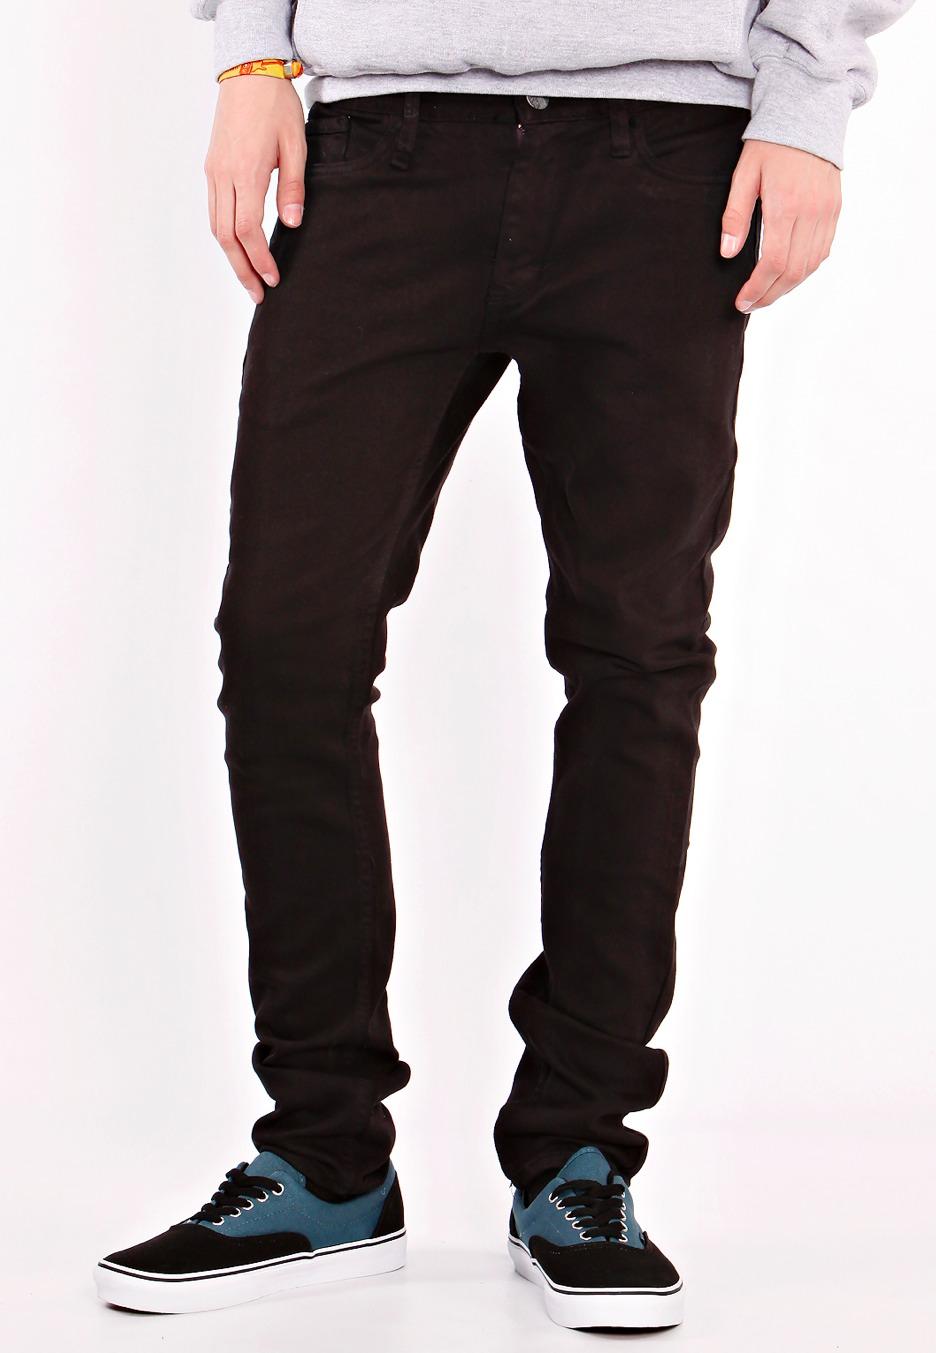 Black Overdye Jeans Ye Jean